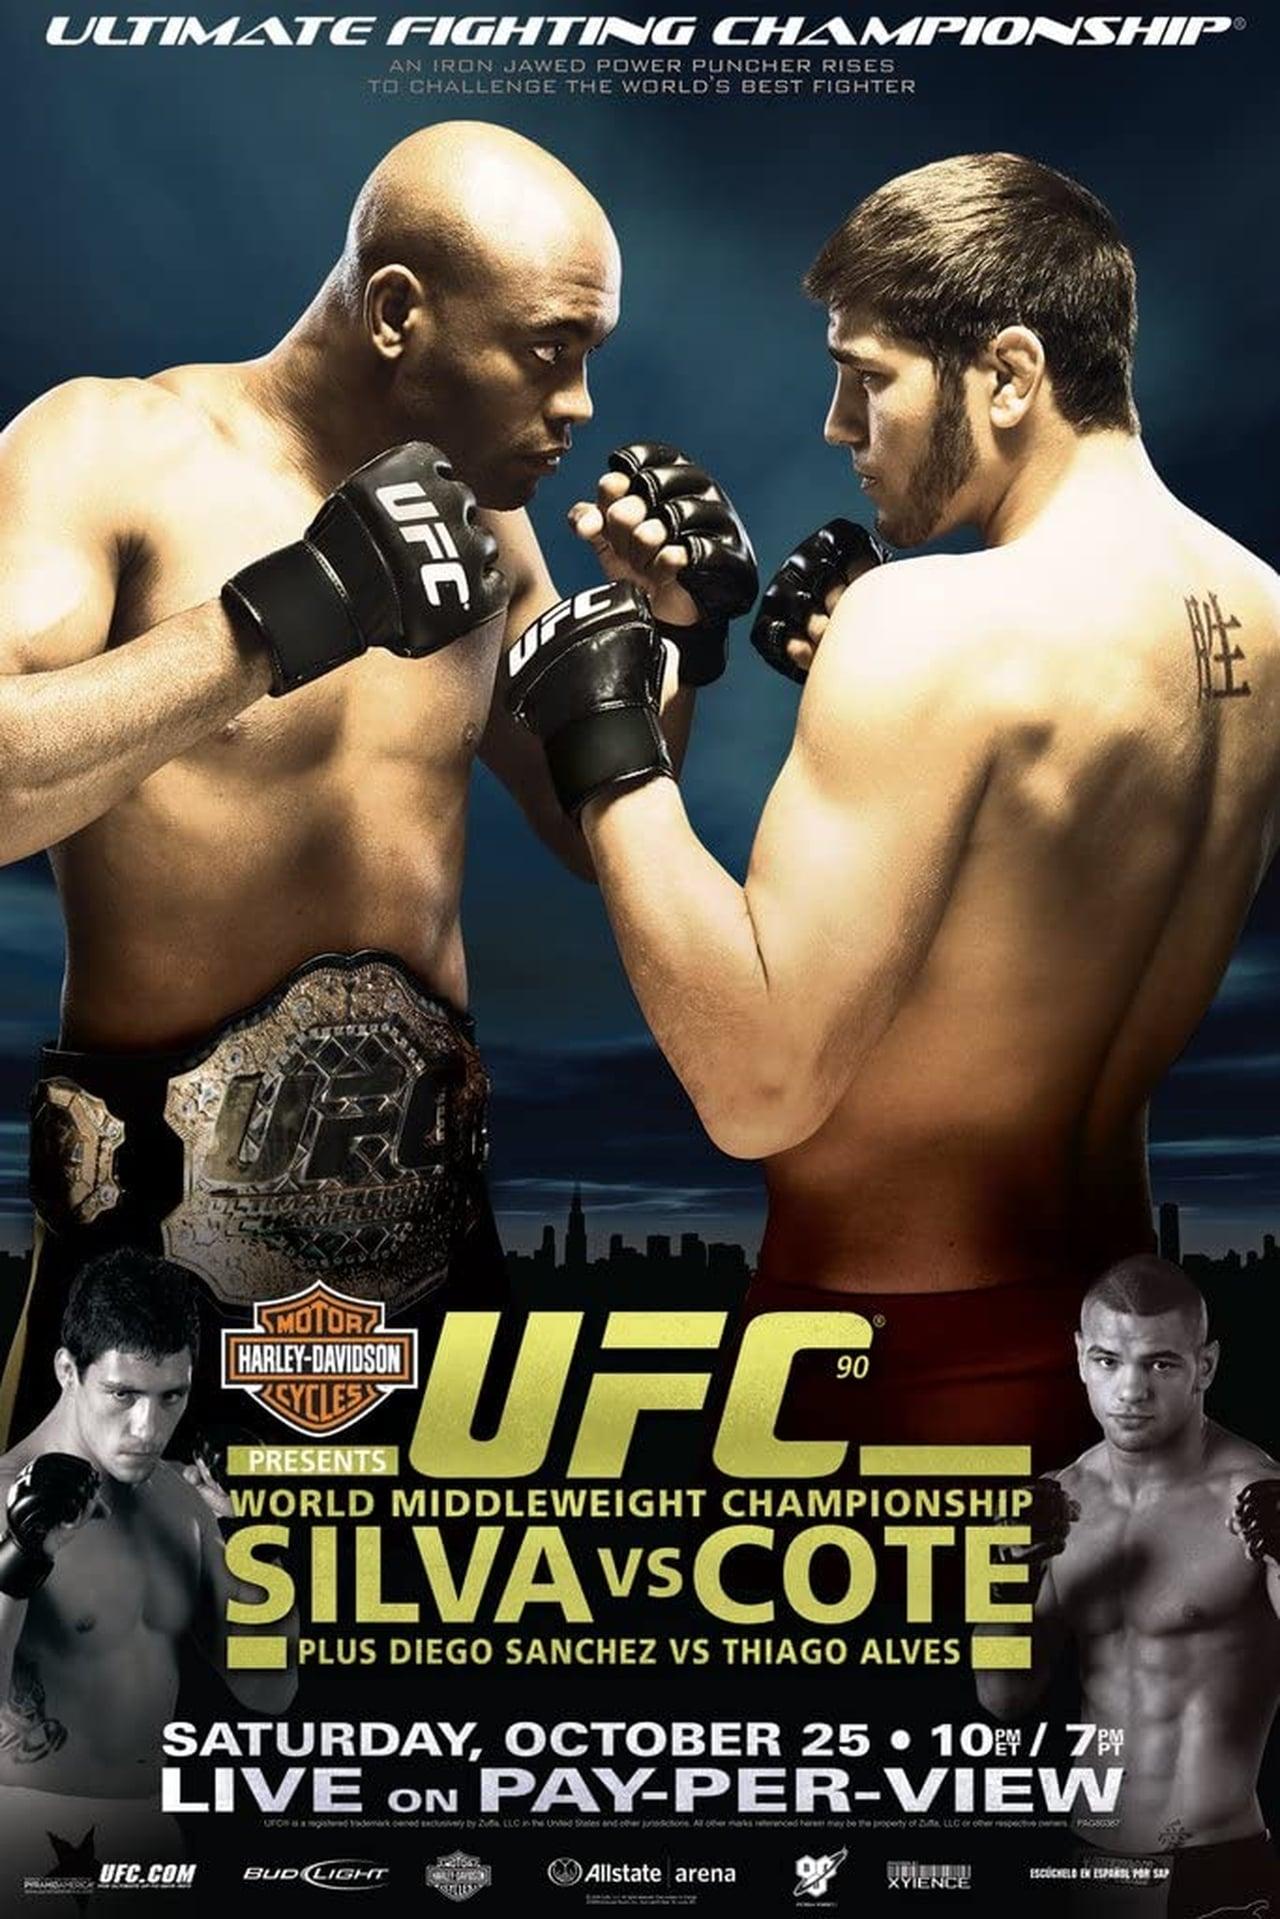 UFC 90: Silva vs. Cote